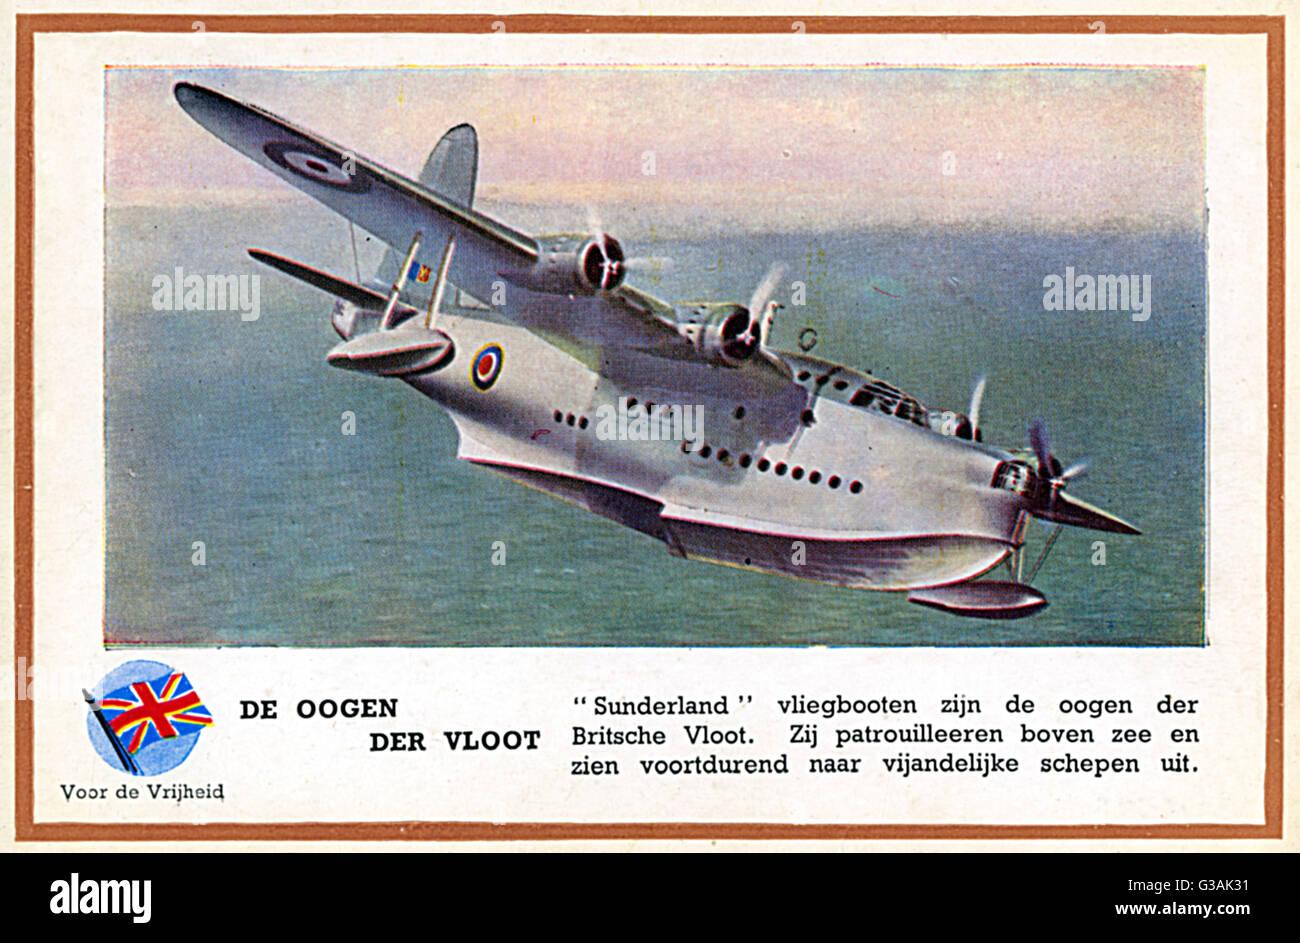 WW2 - British RAF Flying Boat 'Sunderland'     Date: circa 1940 - Stock Image